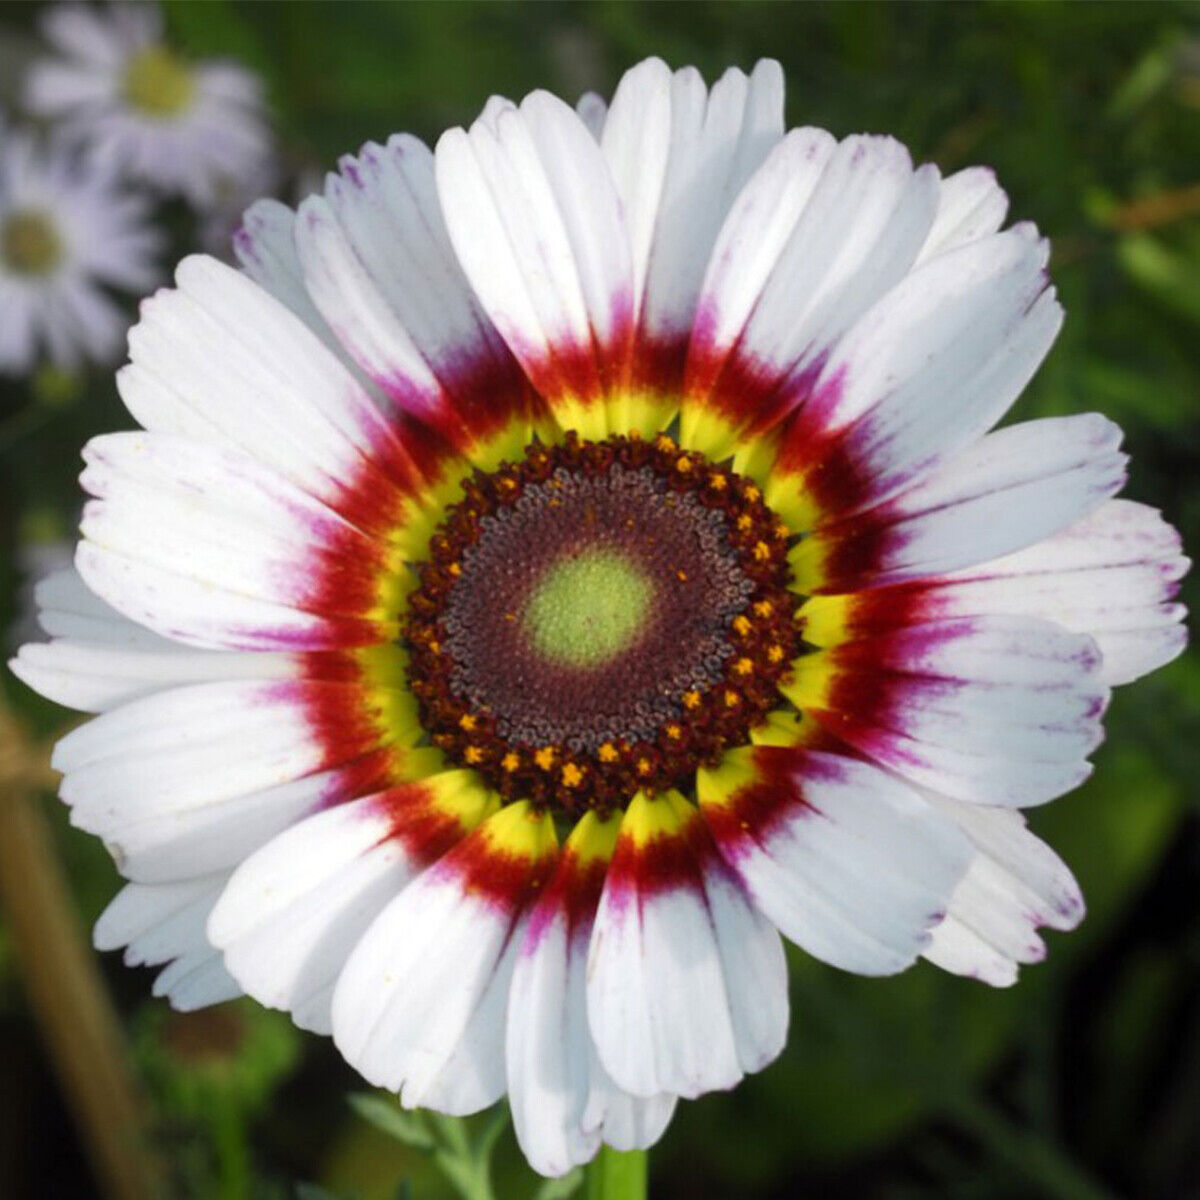 50 Giant Cape Wild Daisy Flower Seeds to Grow 60cm Colourful Plants Zulu Prince